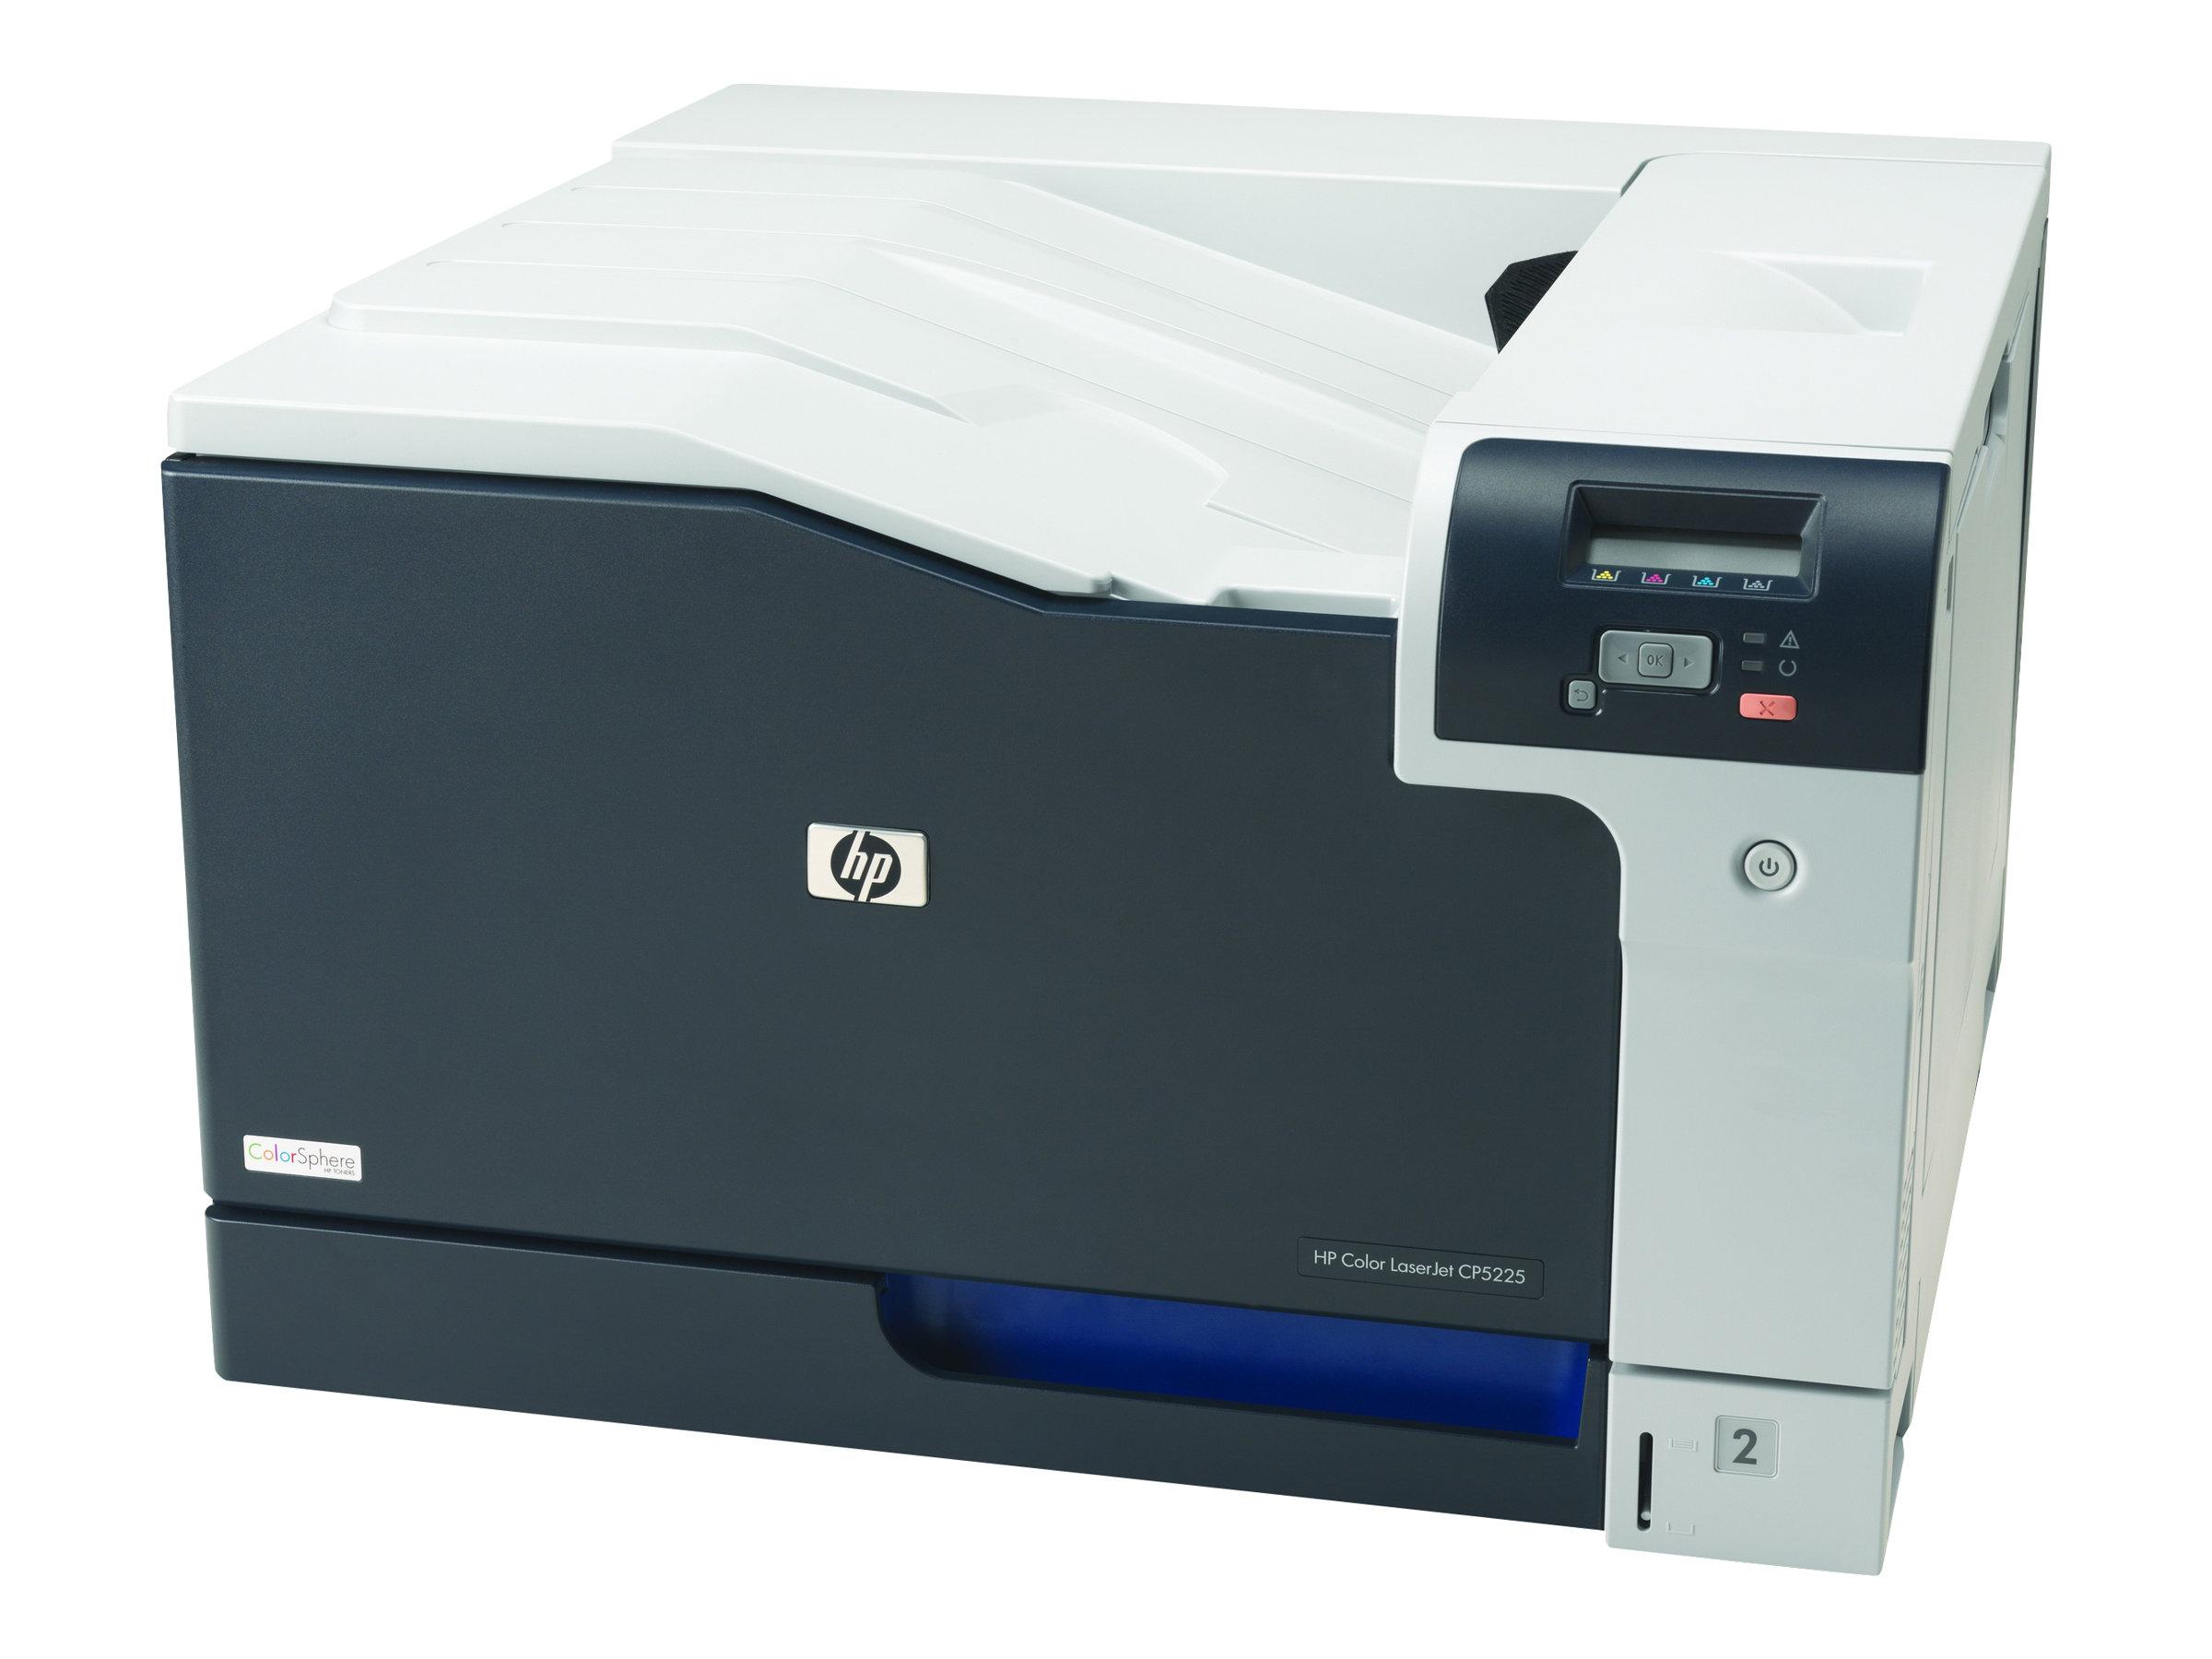 HP Color LaserJet Professional CP5225n - Drucker - Farbe - Laser - A3 - 600 dpi